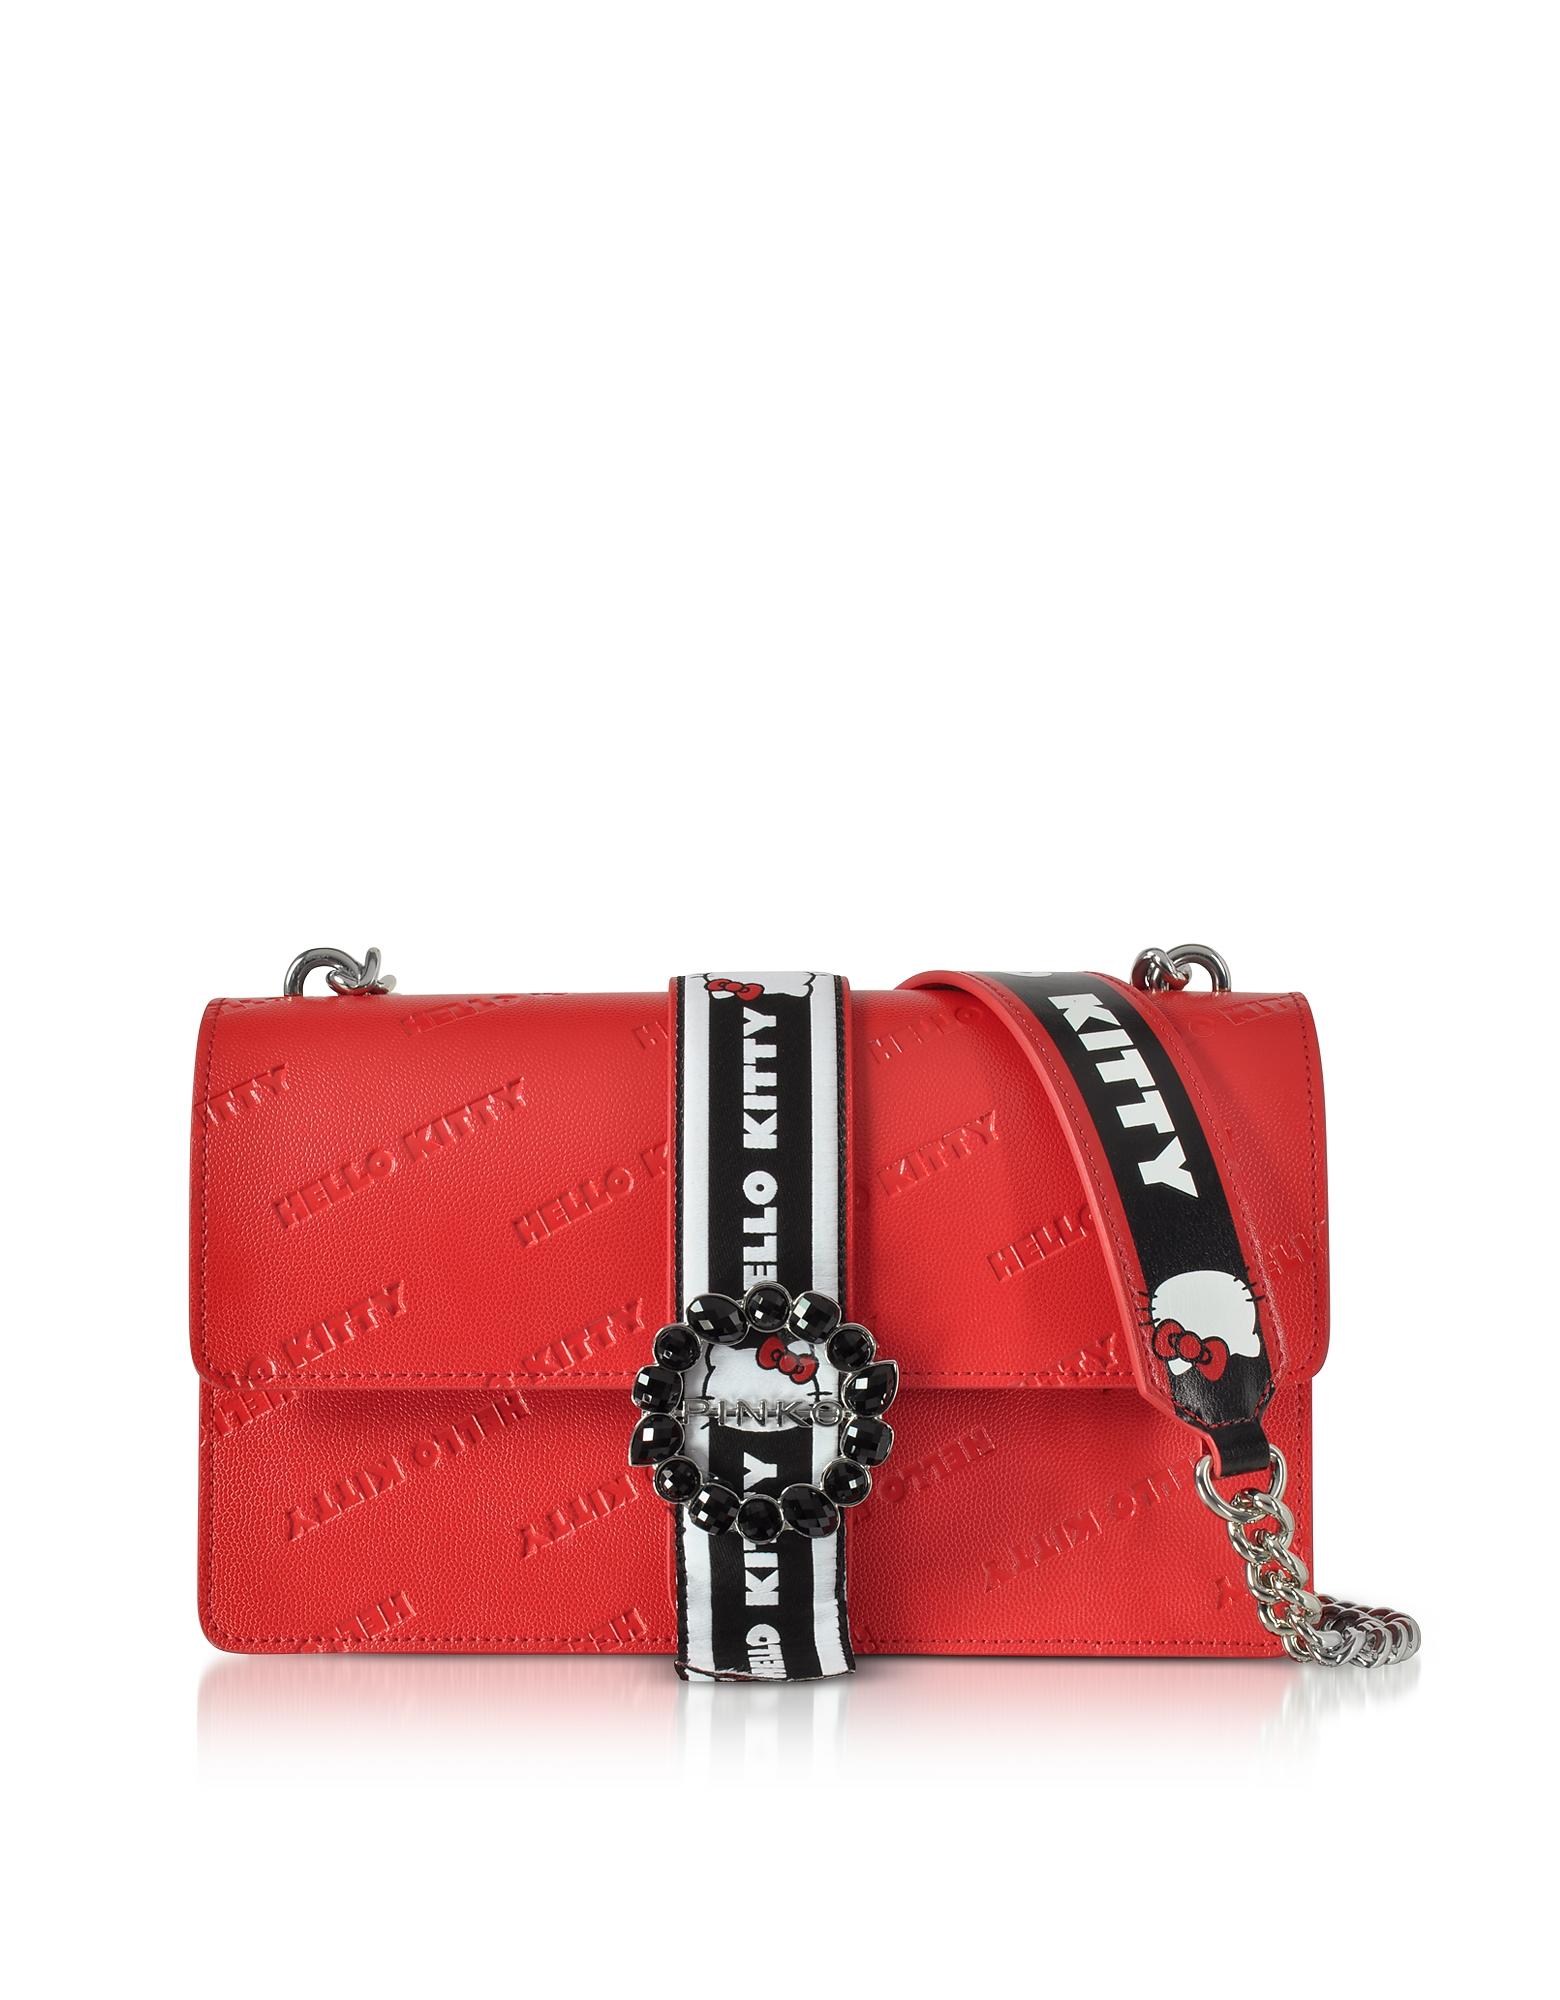 Pinko Handbags, Love Hello Kitty Red Printed Eco Leather Shoulder Bag